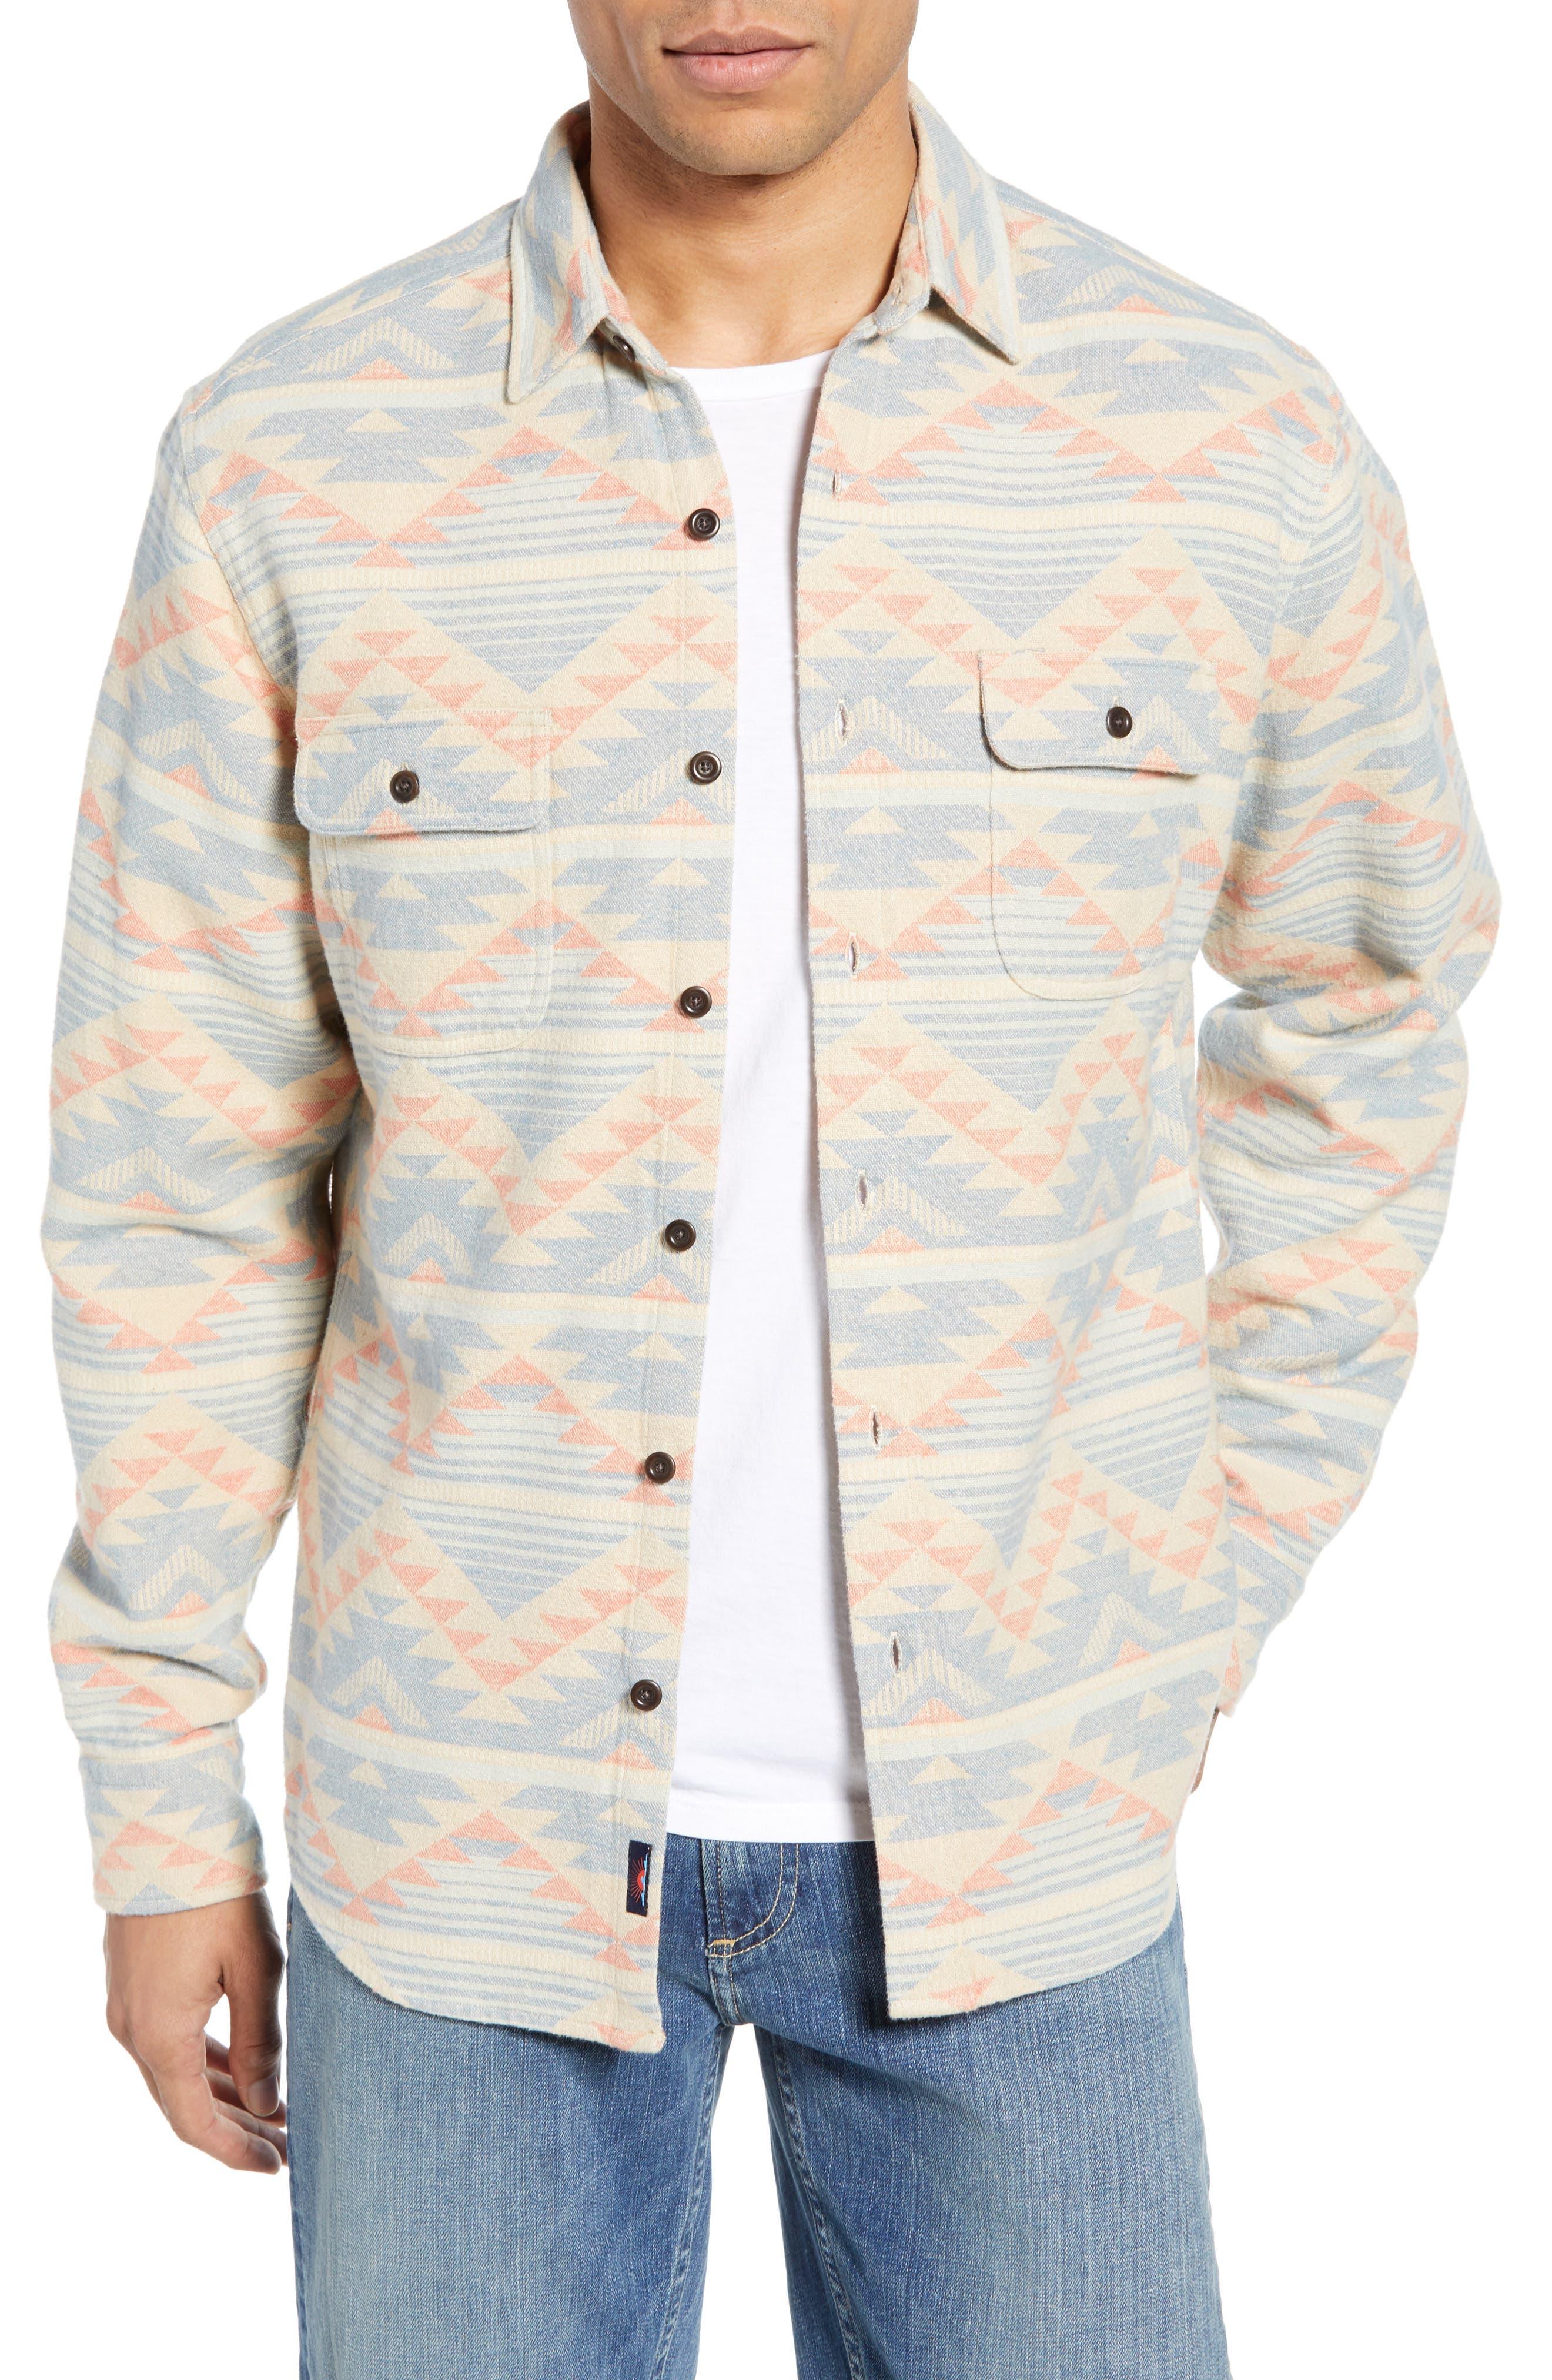 Faherty Belmar Organic Cotton Shirt, Beige